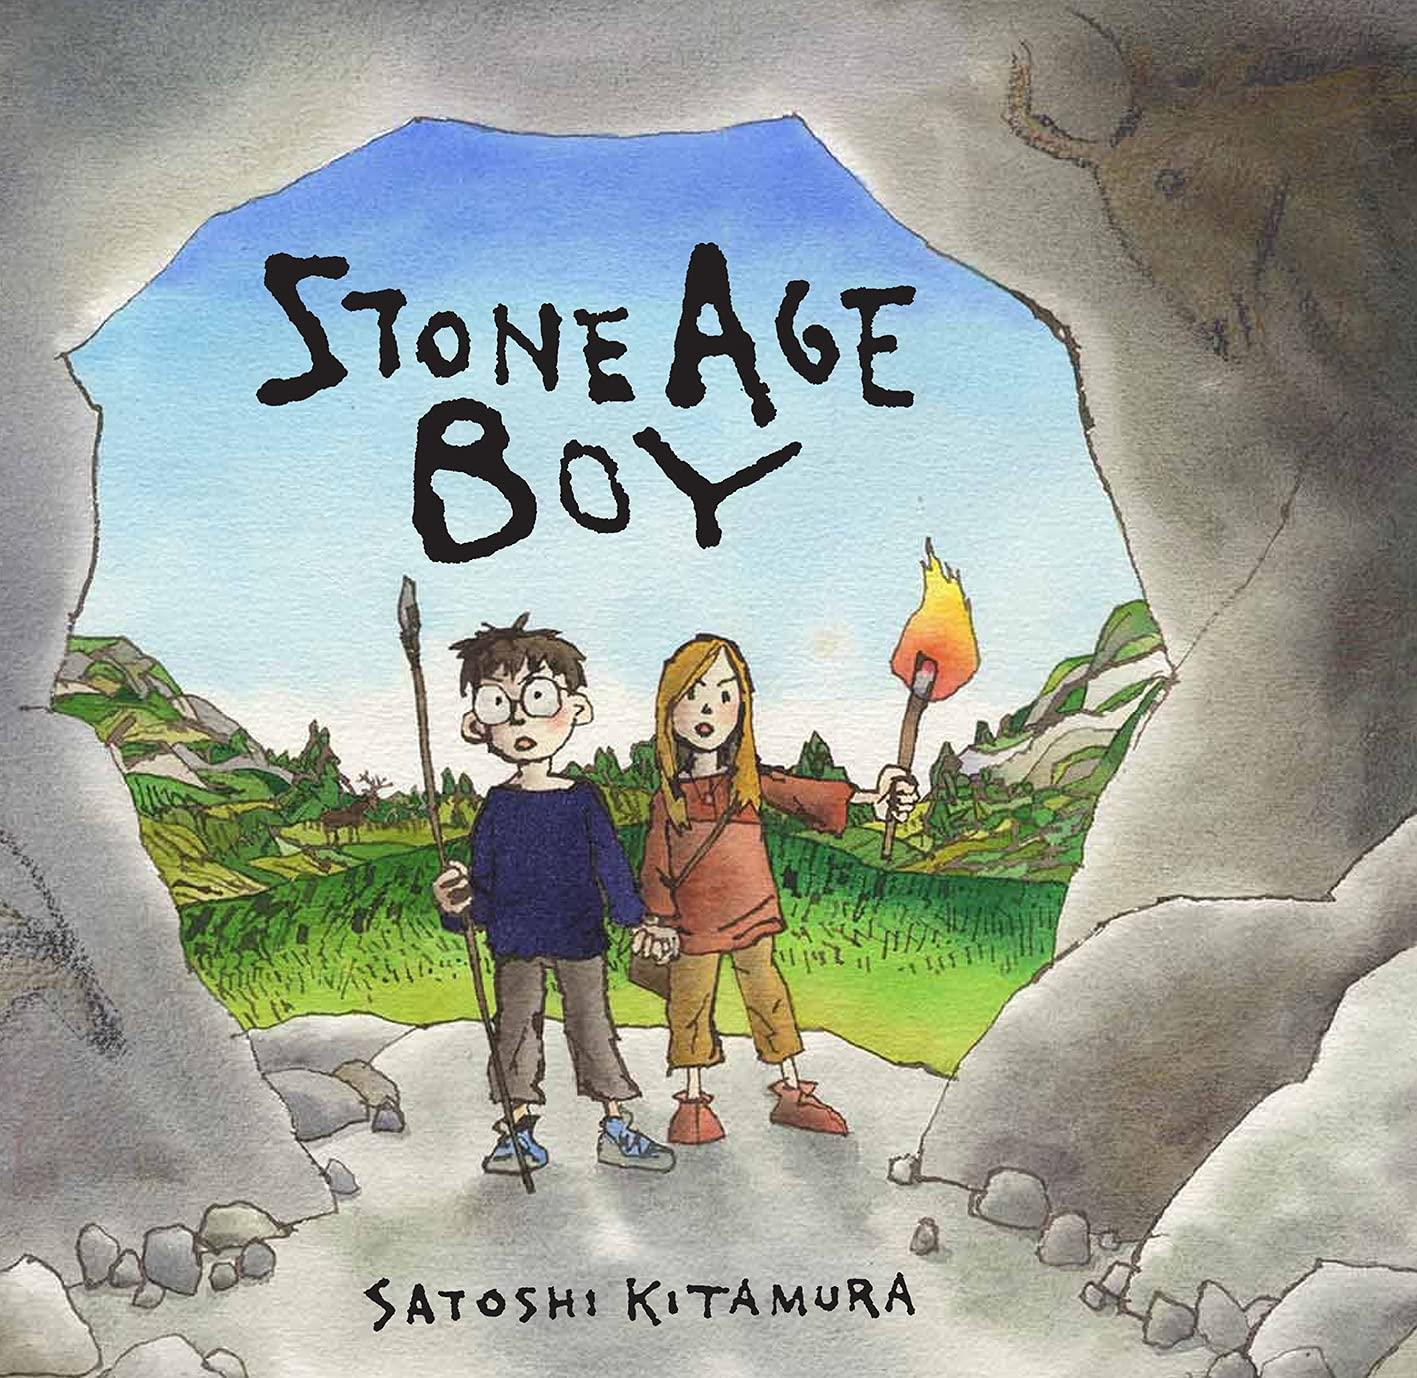 Stone Age Boy: Amazon.co.uk: Kitamura, Satoshi, Kitamura, Satoshi:  0787721953272: Books